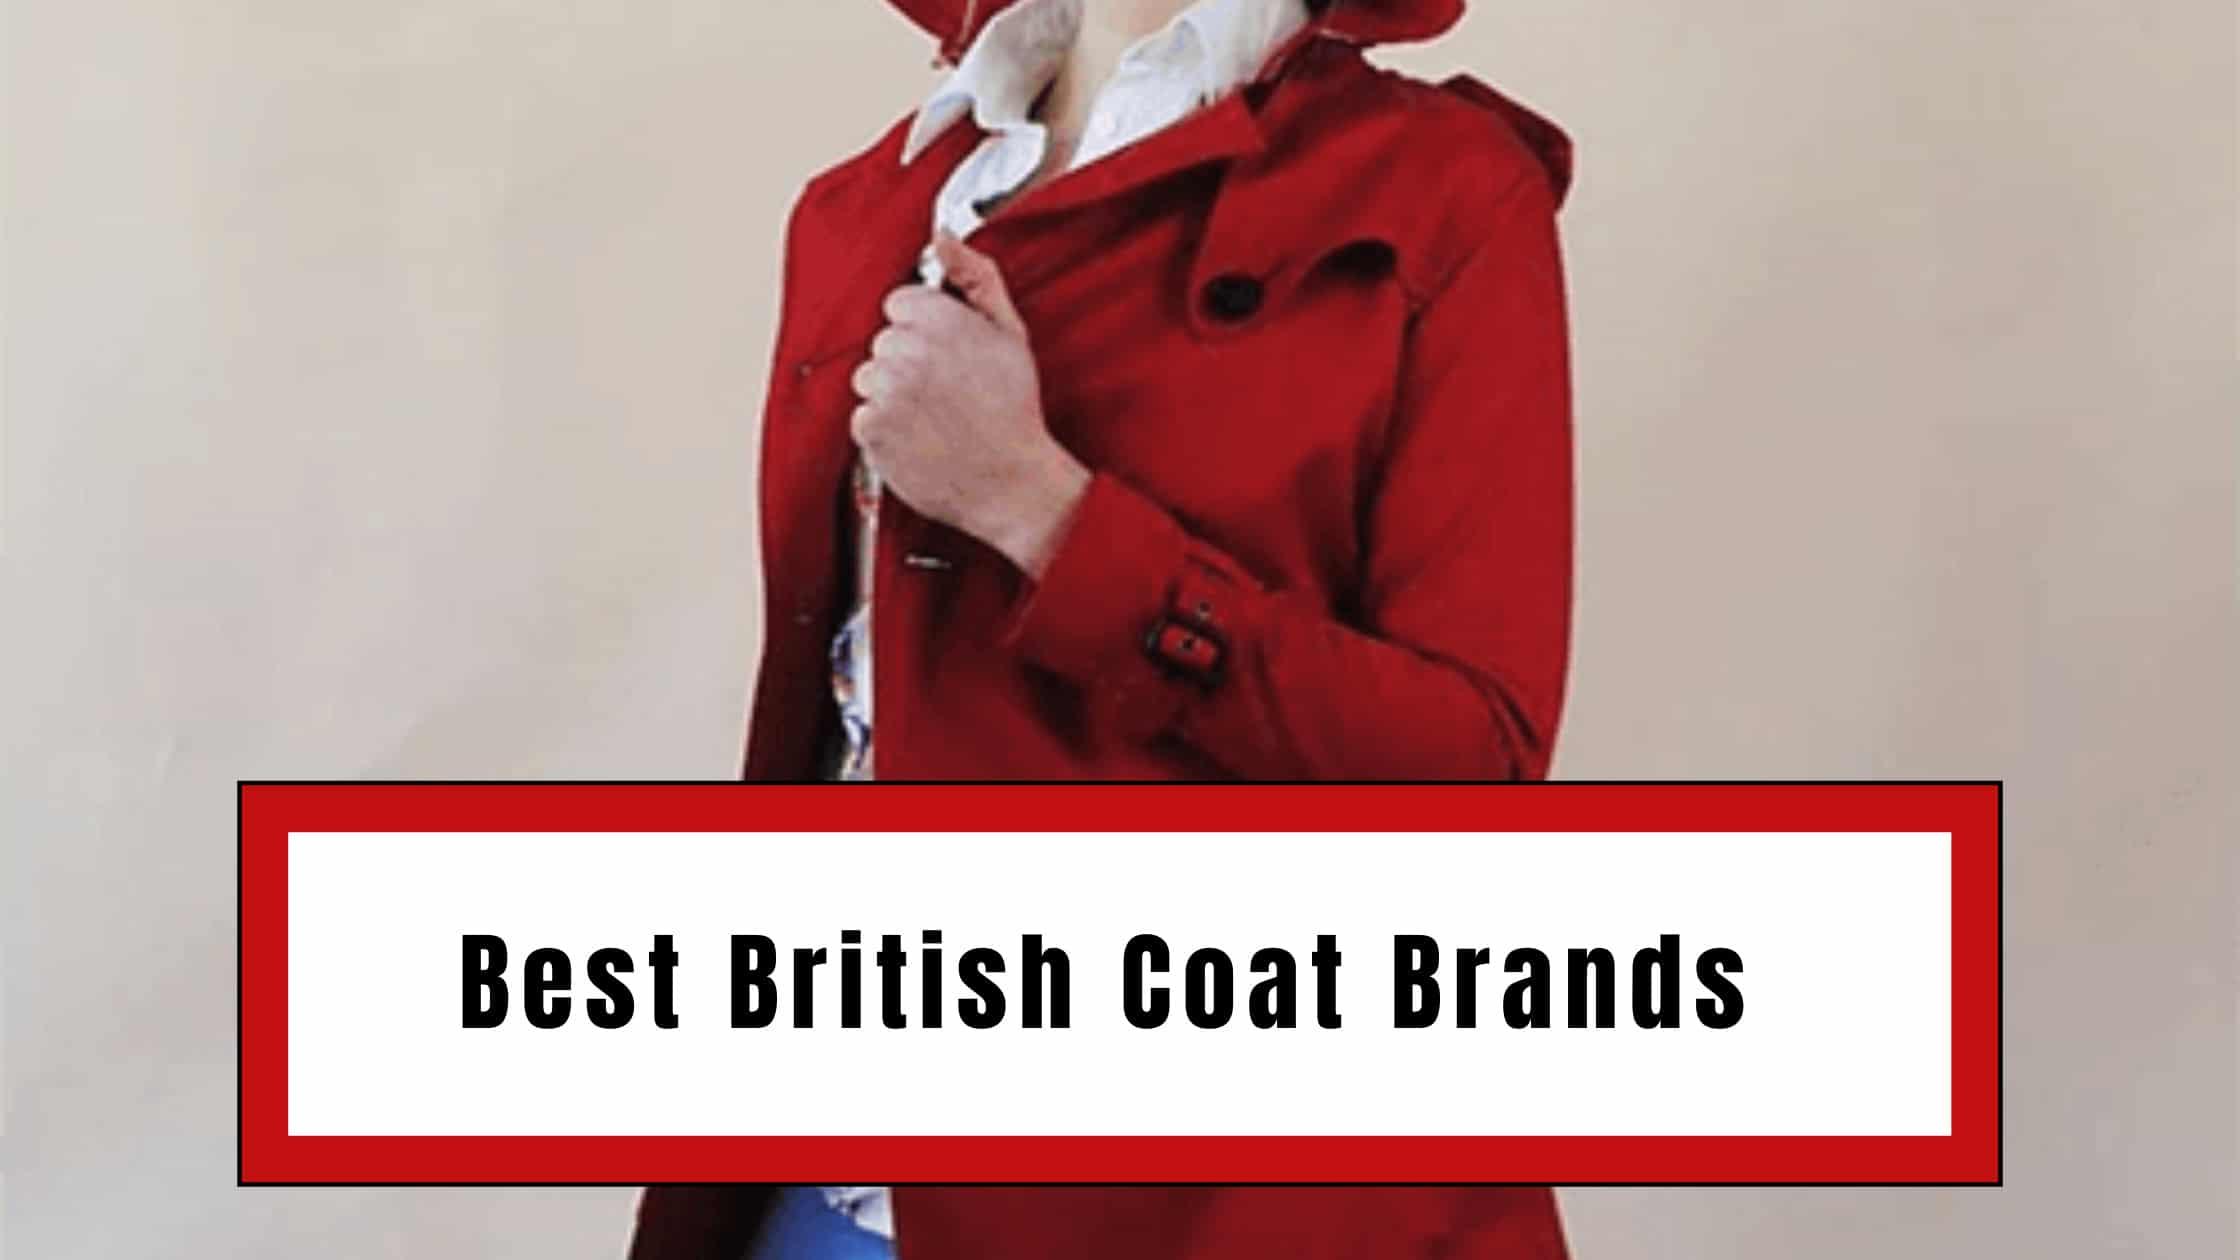 Best British Coat Brands